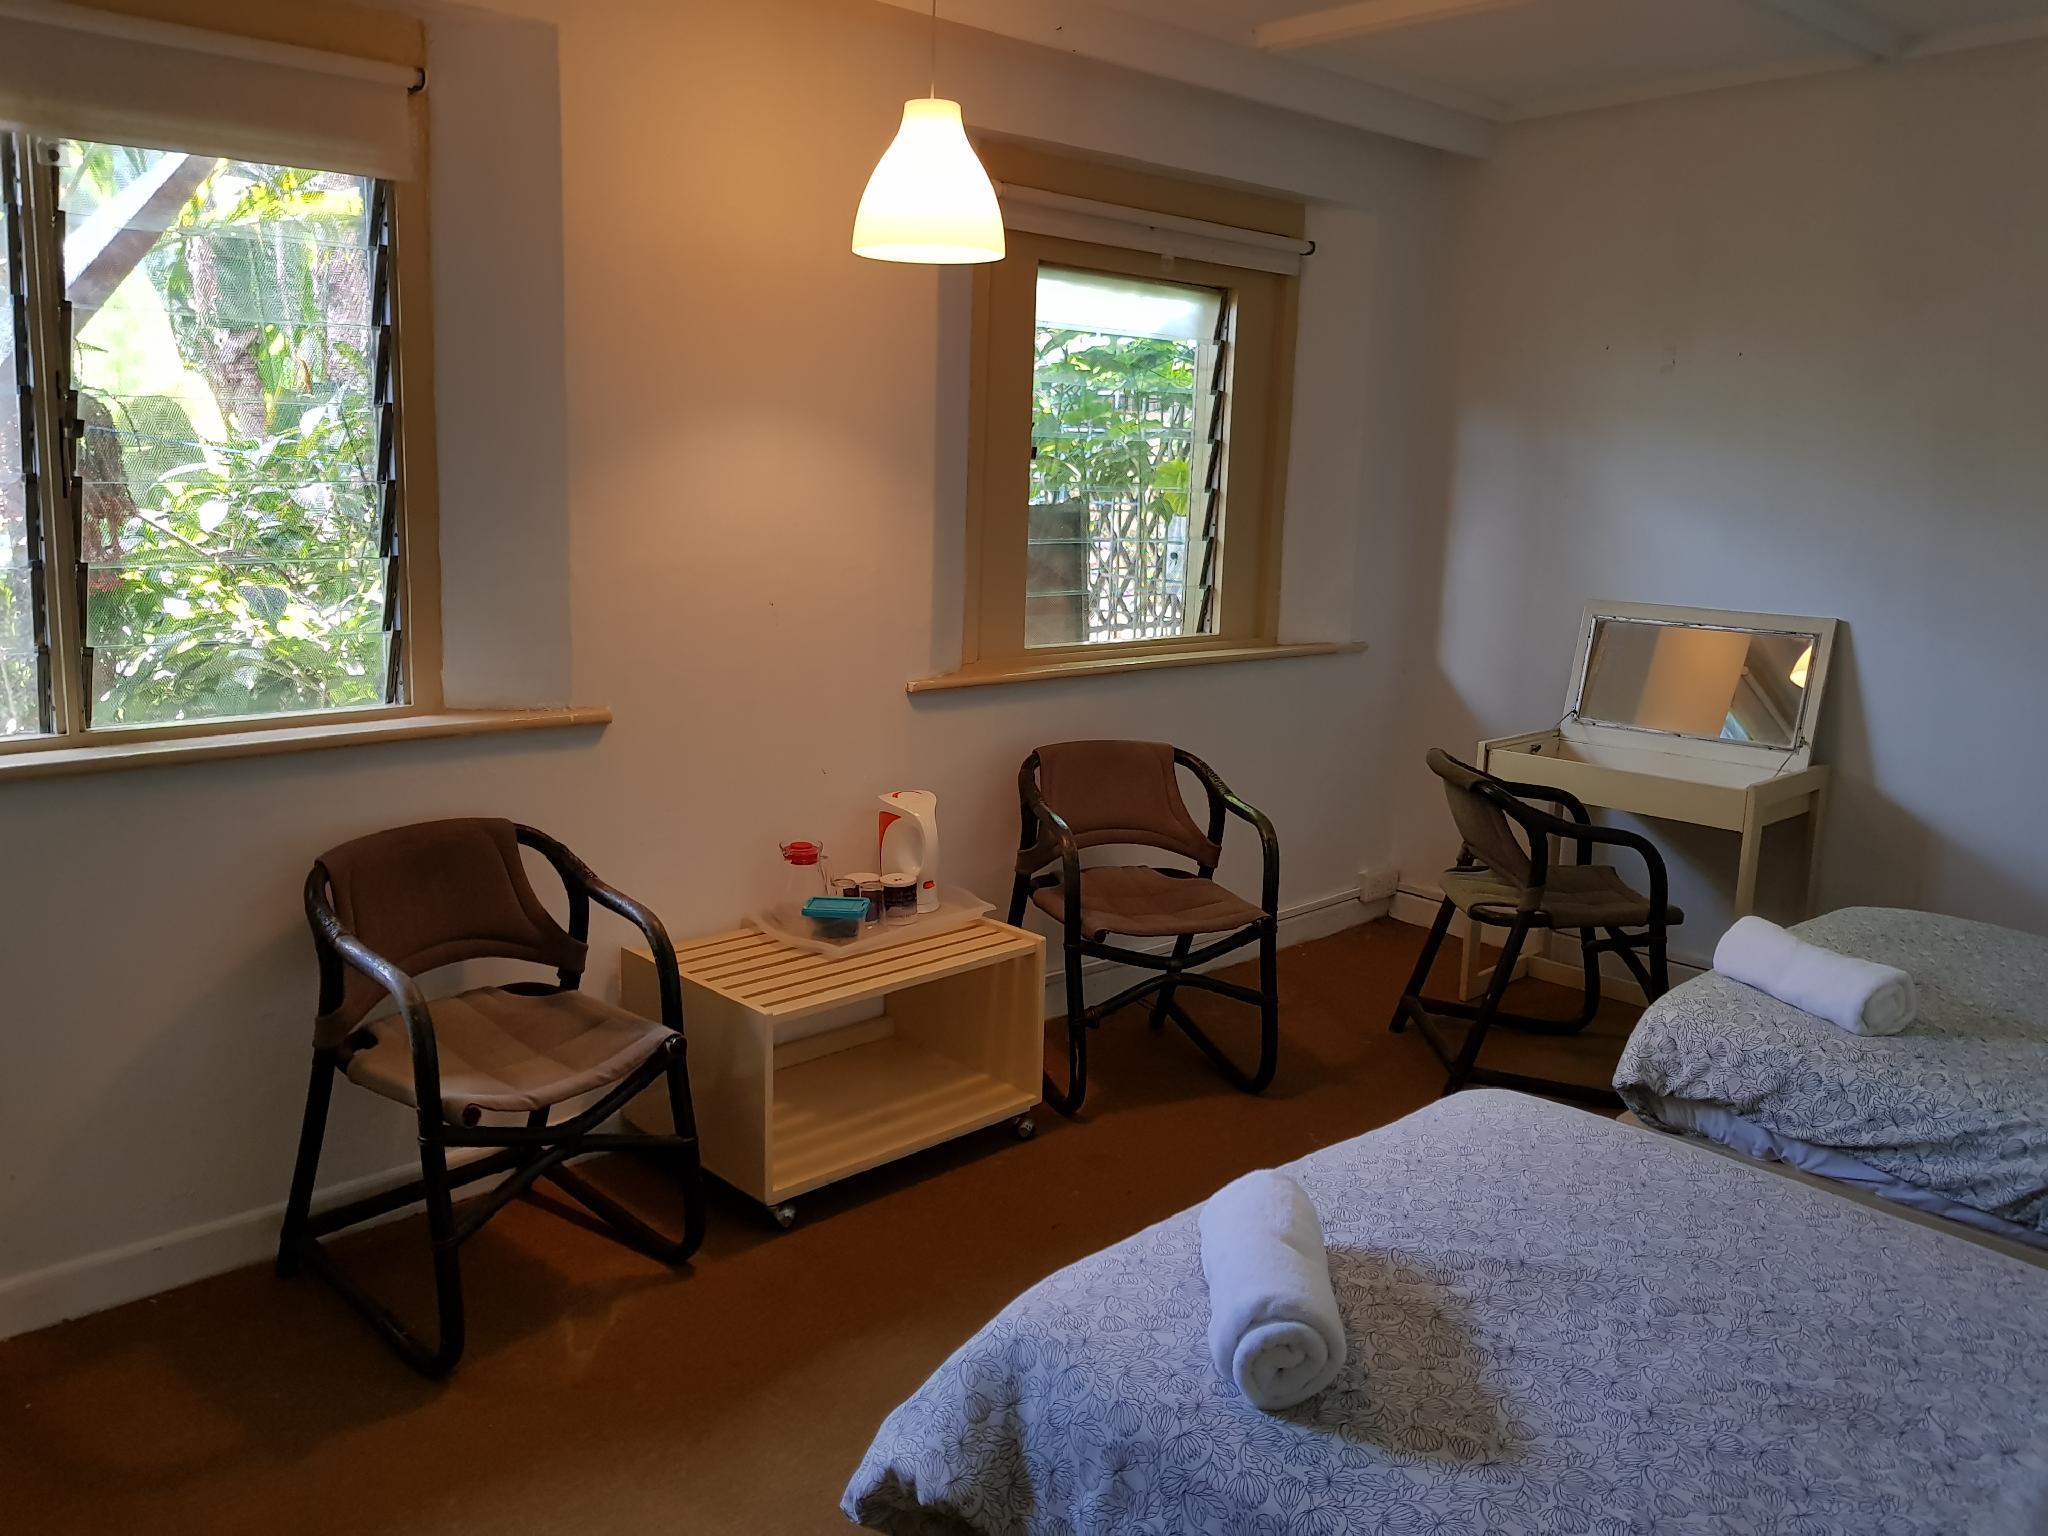 Hotel Bellevue Penang Hill Malaysia Mulai Dari Rp 606450